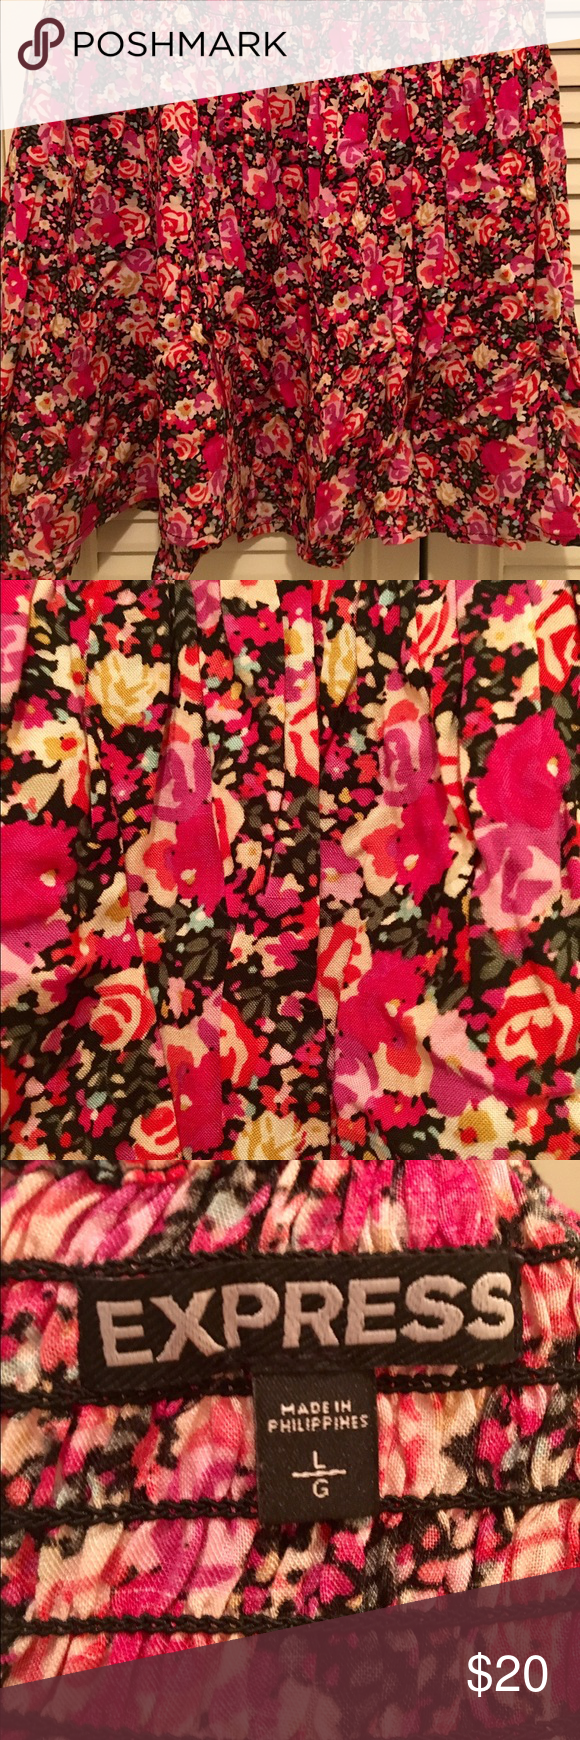 Pink floral miniskirt Floral miniskirt from Express. Lightweight and perfect for summer. Elastic waistband. Express Skirts Mini